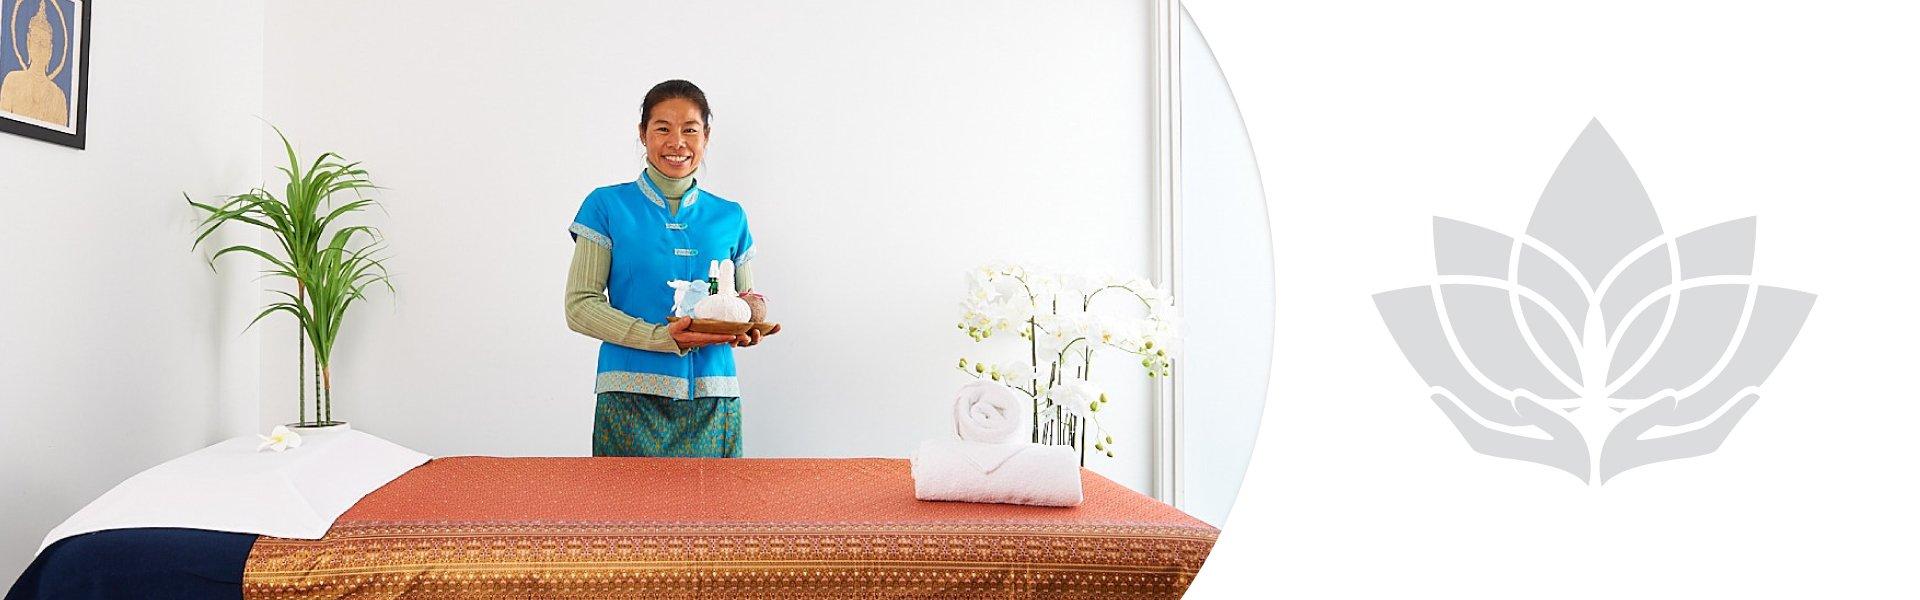 The best thai massages in Mount Maunganui at Krisada Thai Massage